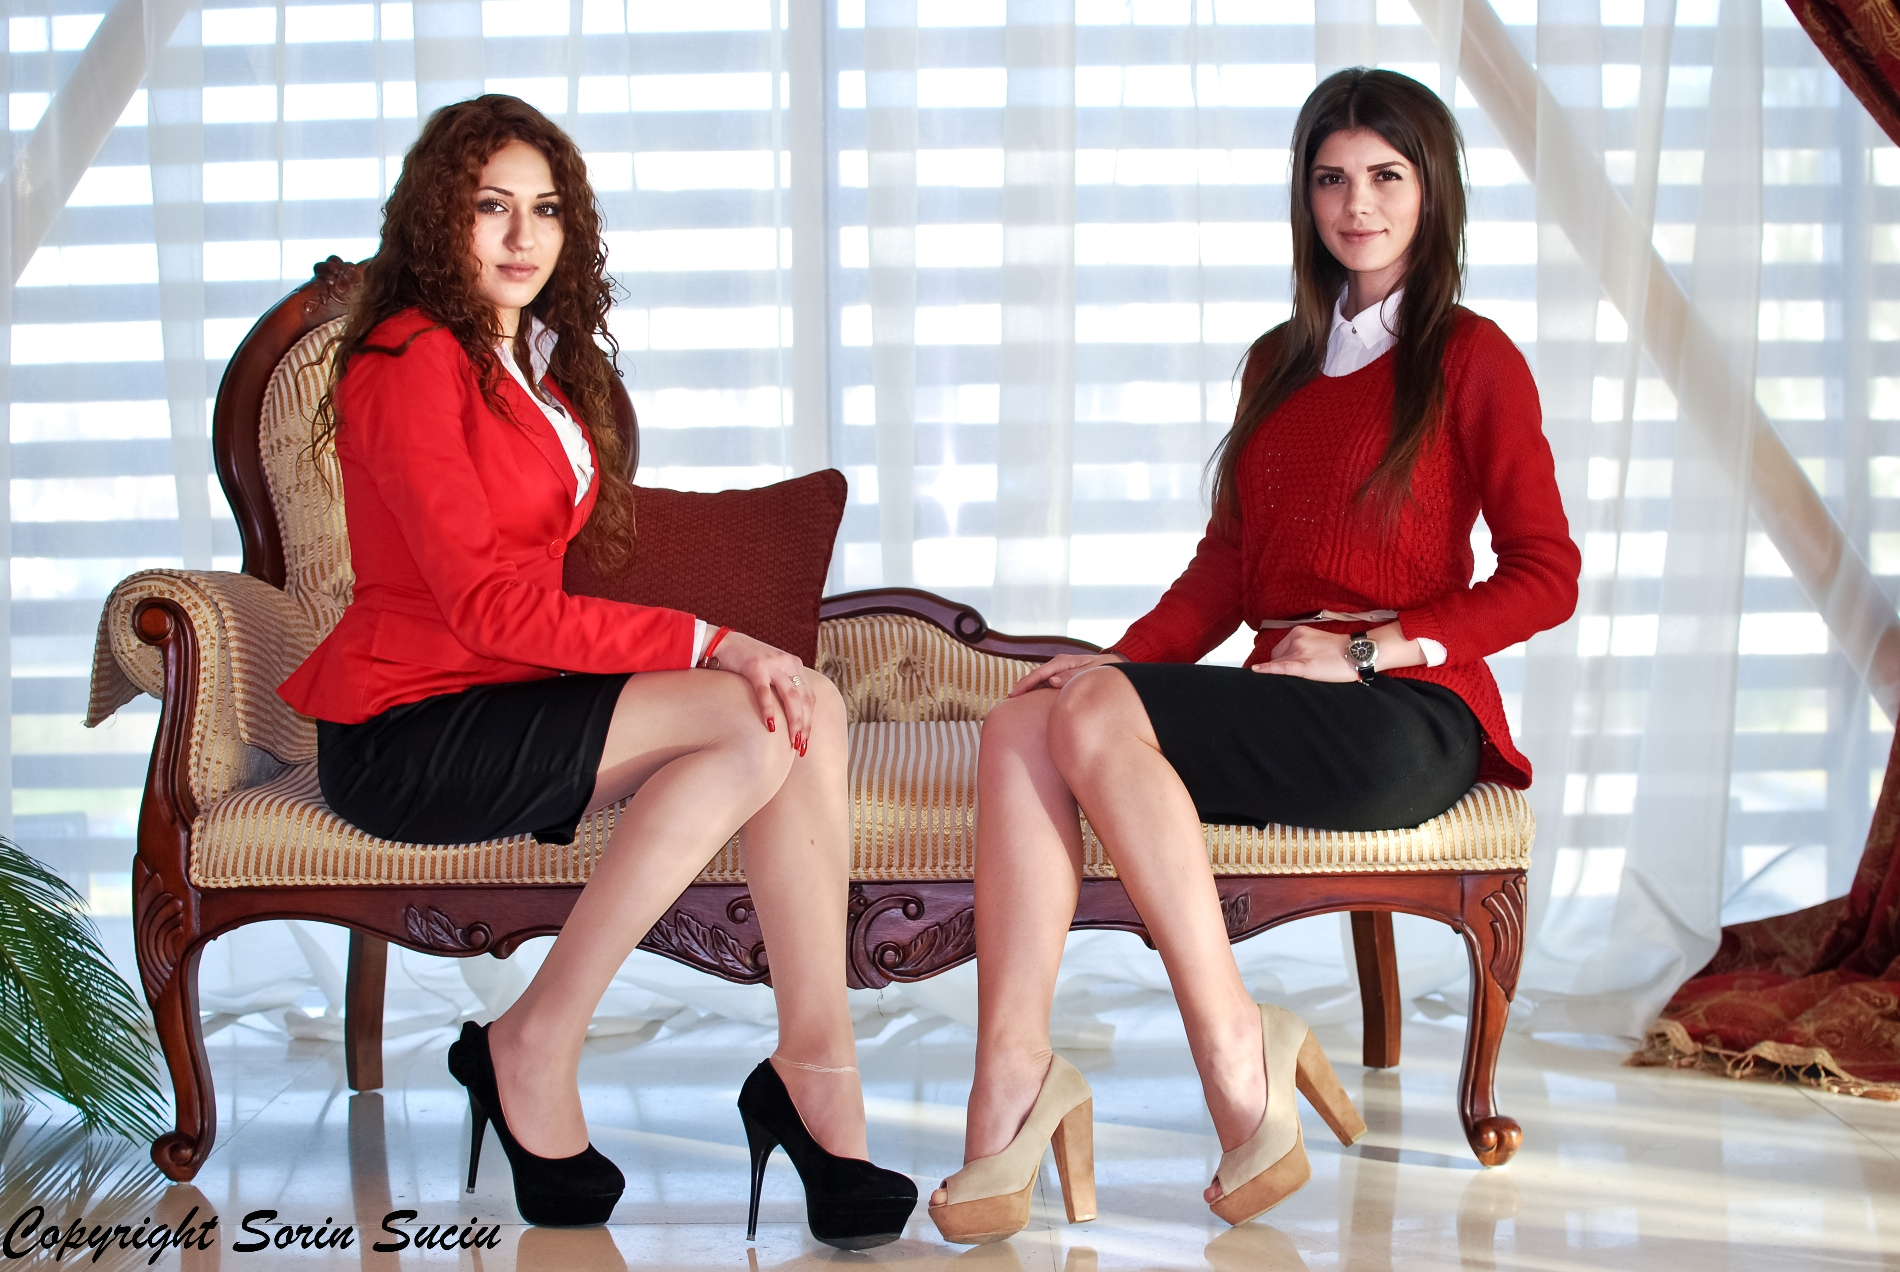 Hostess+evenimente+corporate.jpg